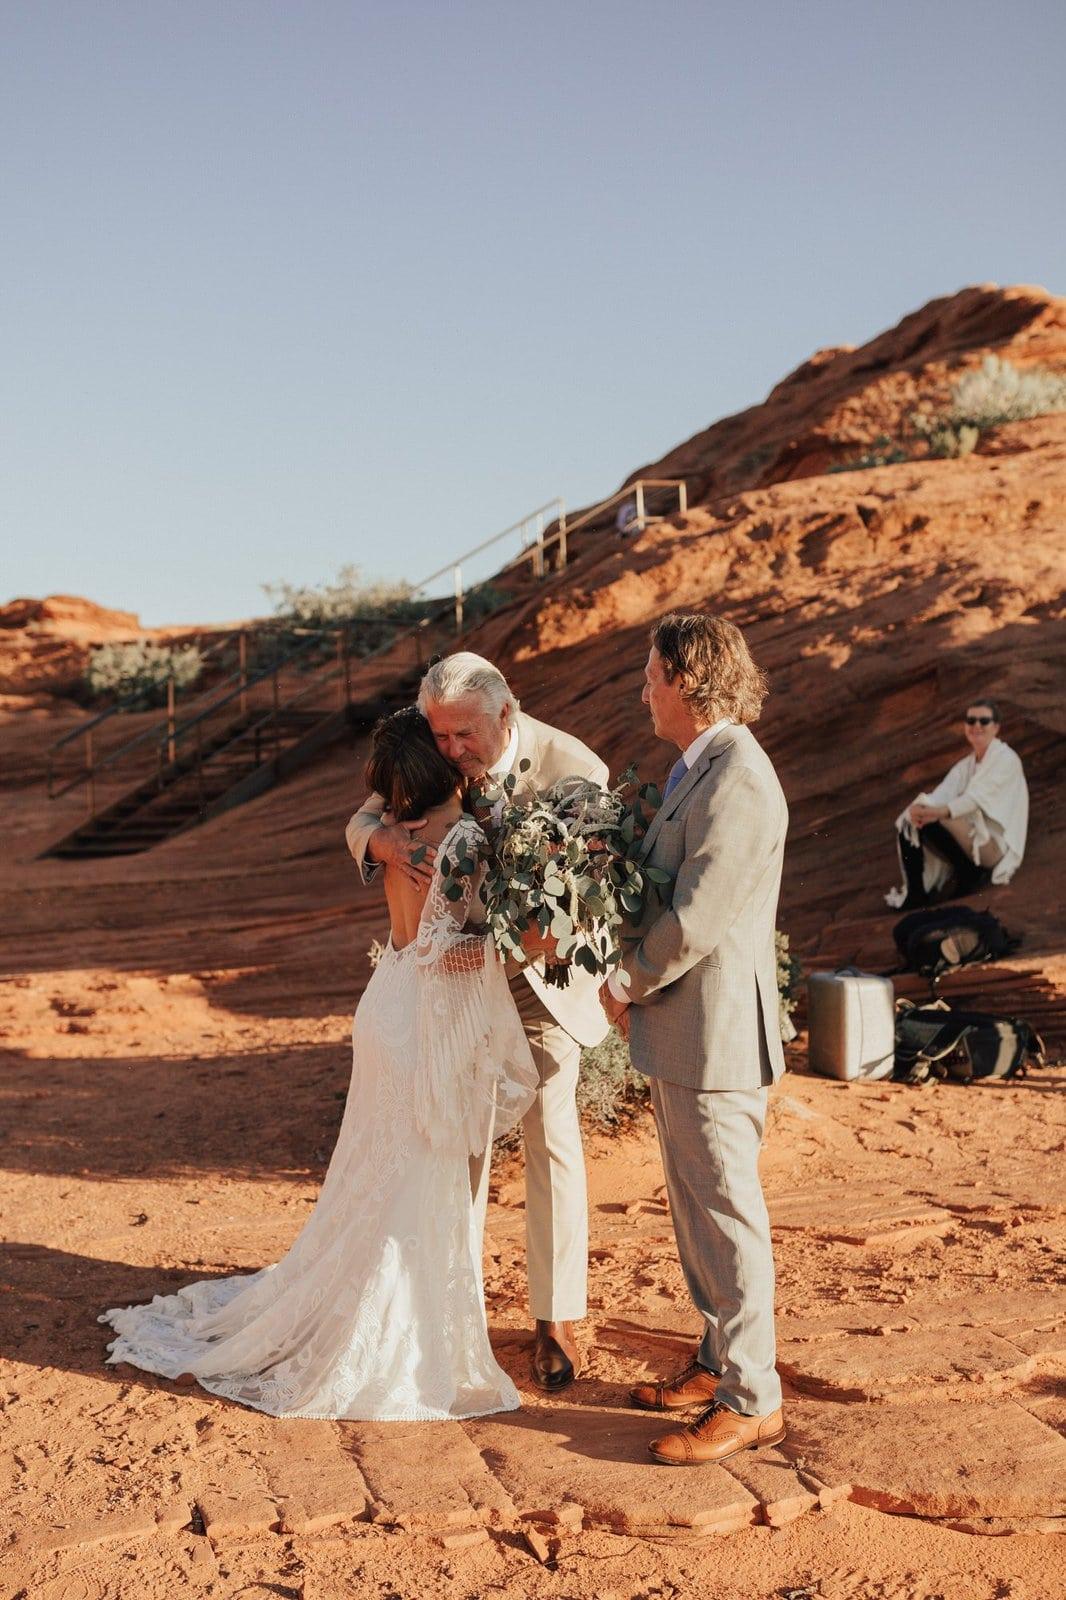 elopement photography in Arizona.